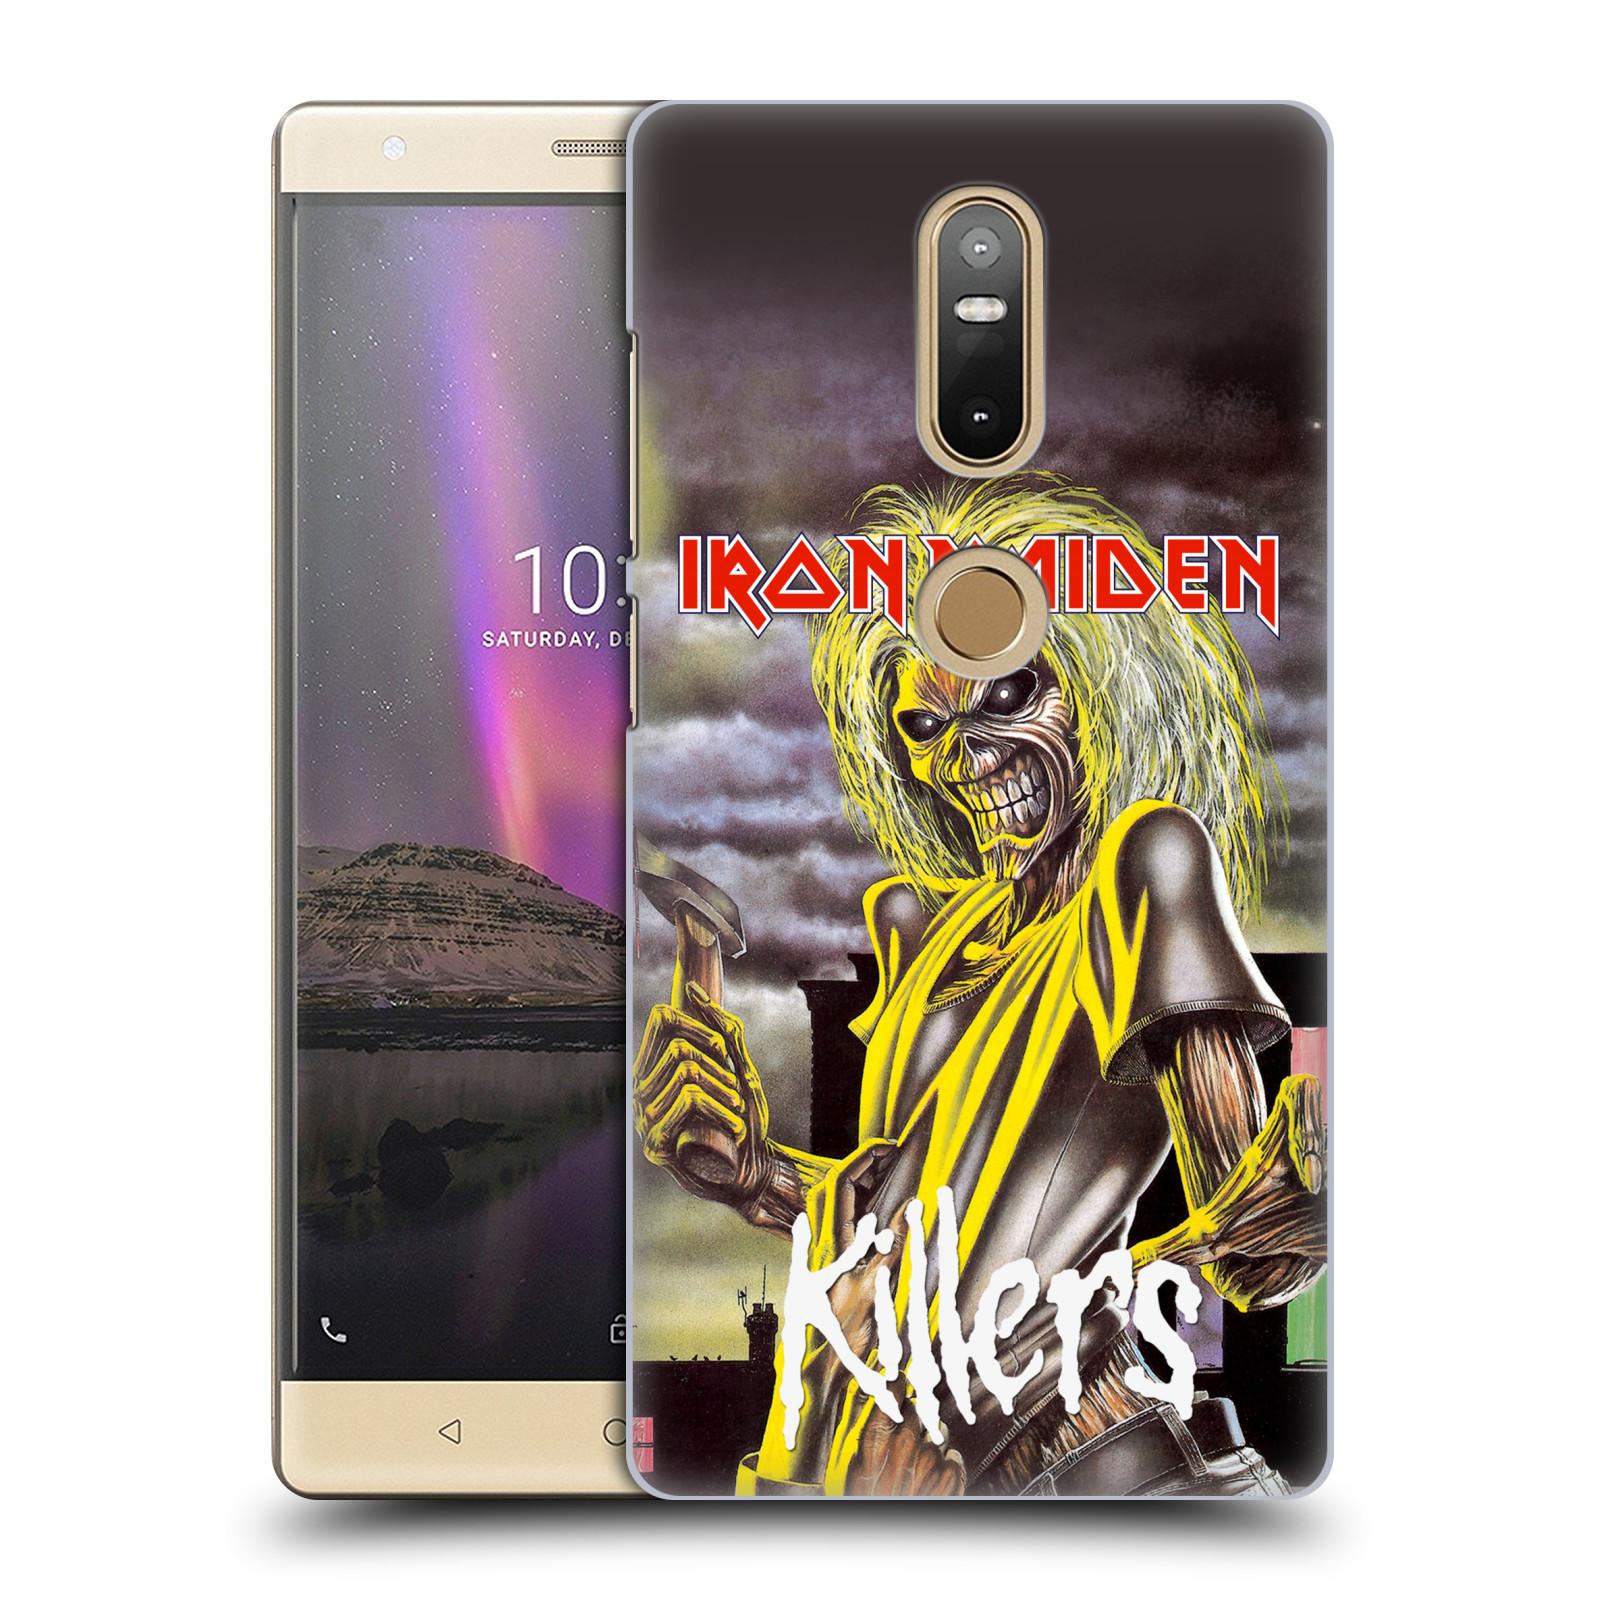 Plastové pouzdro na mobil Lenovo Phab 2 Plus - Head Case - Iron Maiden - Killers (Plastový kryt či obal na mobilní telefon Lenovo Phab 2 Plus Dual SIM s motivem Iron Maiden - Killers)